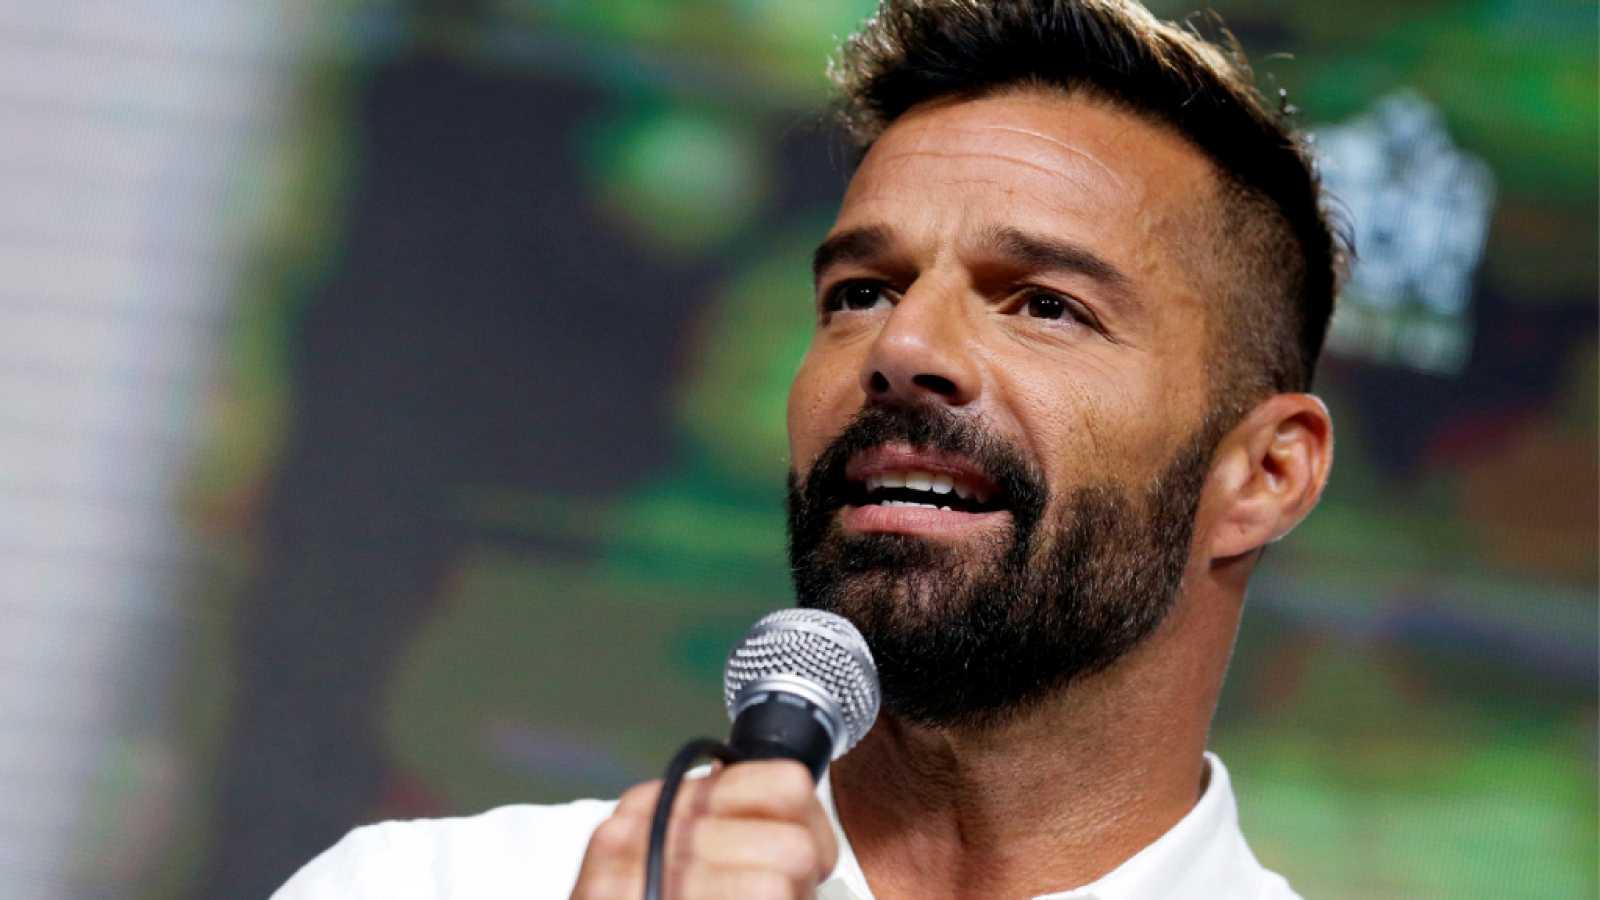 Ricky Martin lanza 'Pausa', un EP donde colabora con Bad Bunny y Residente